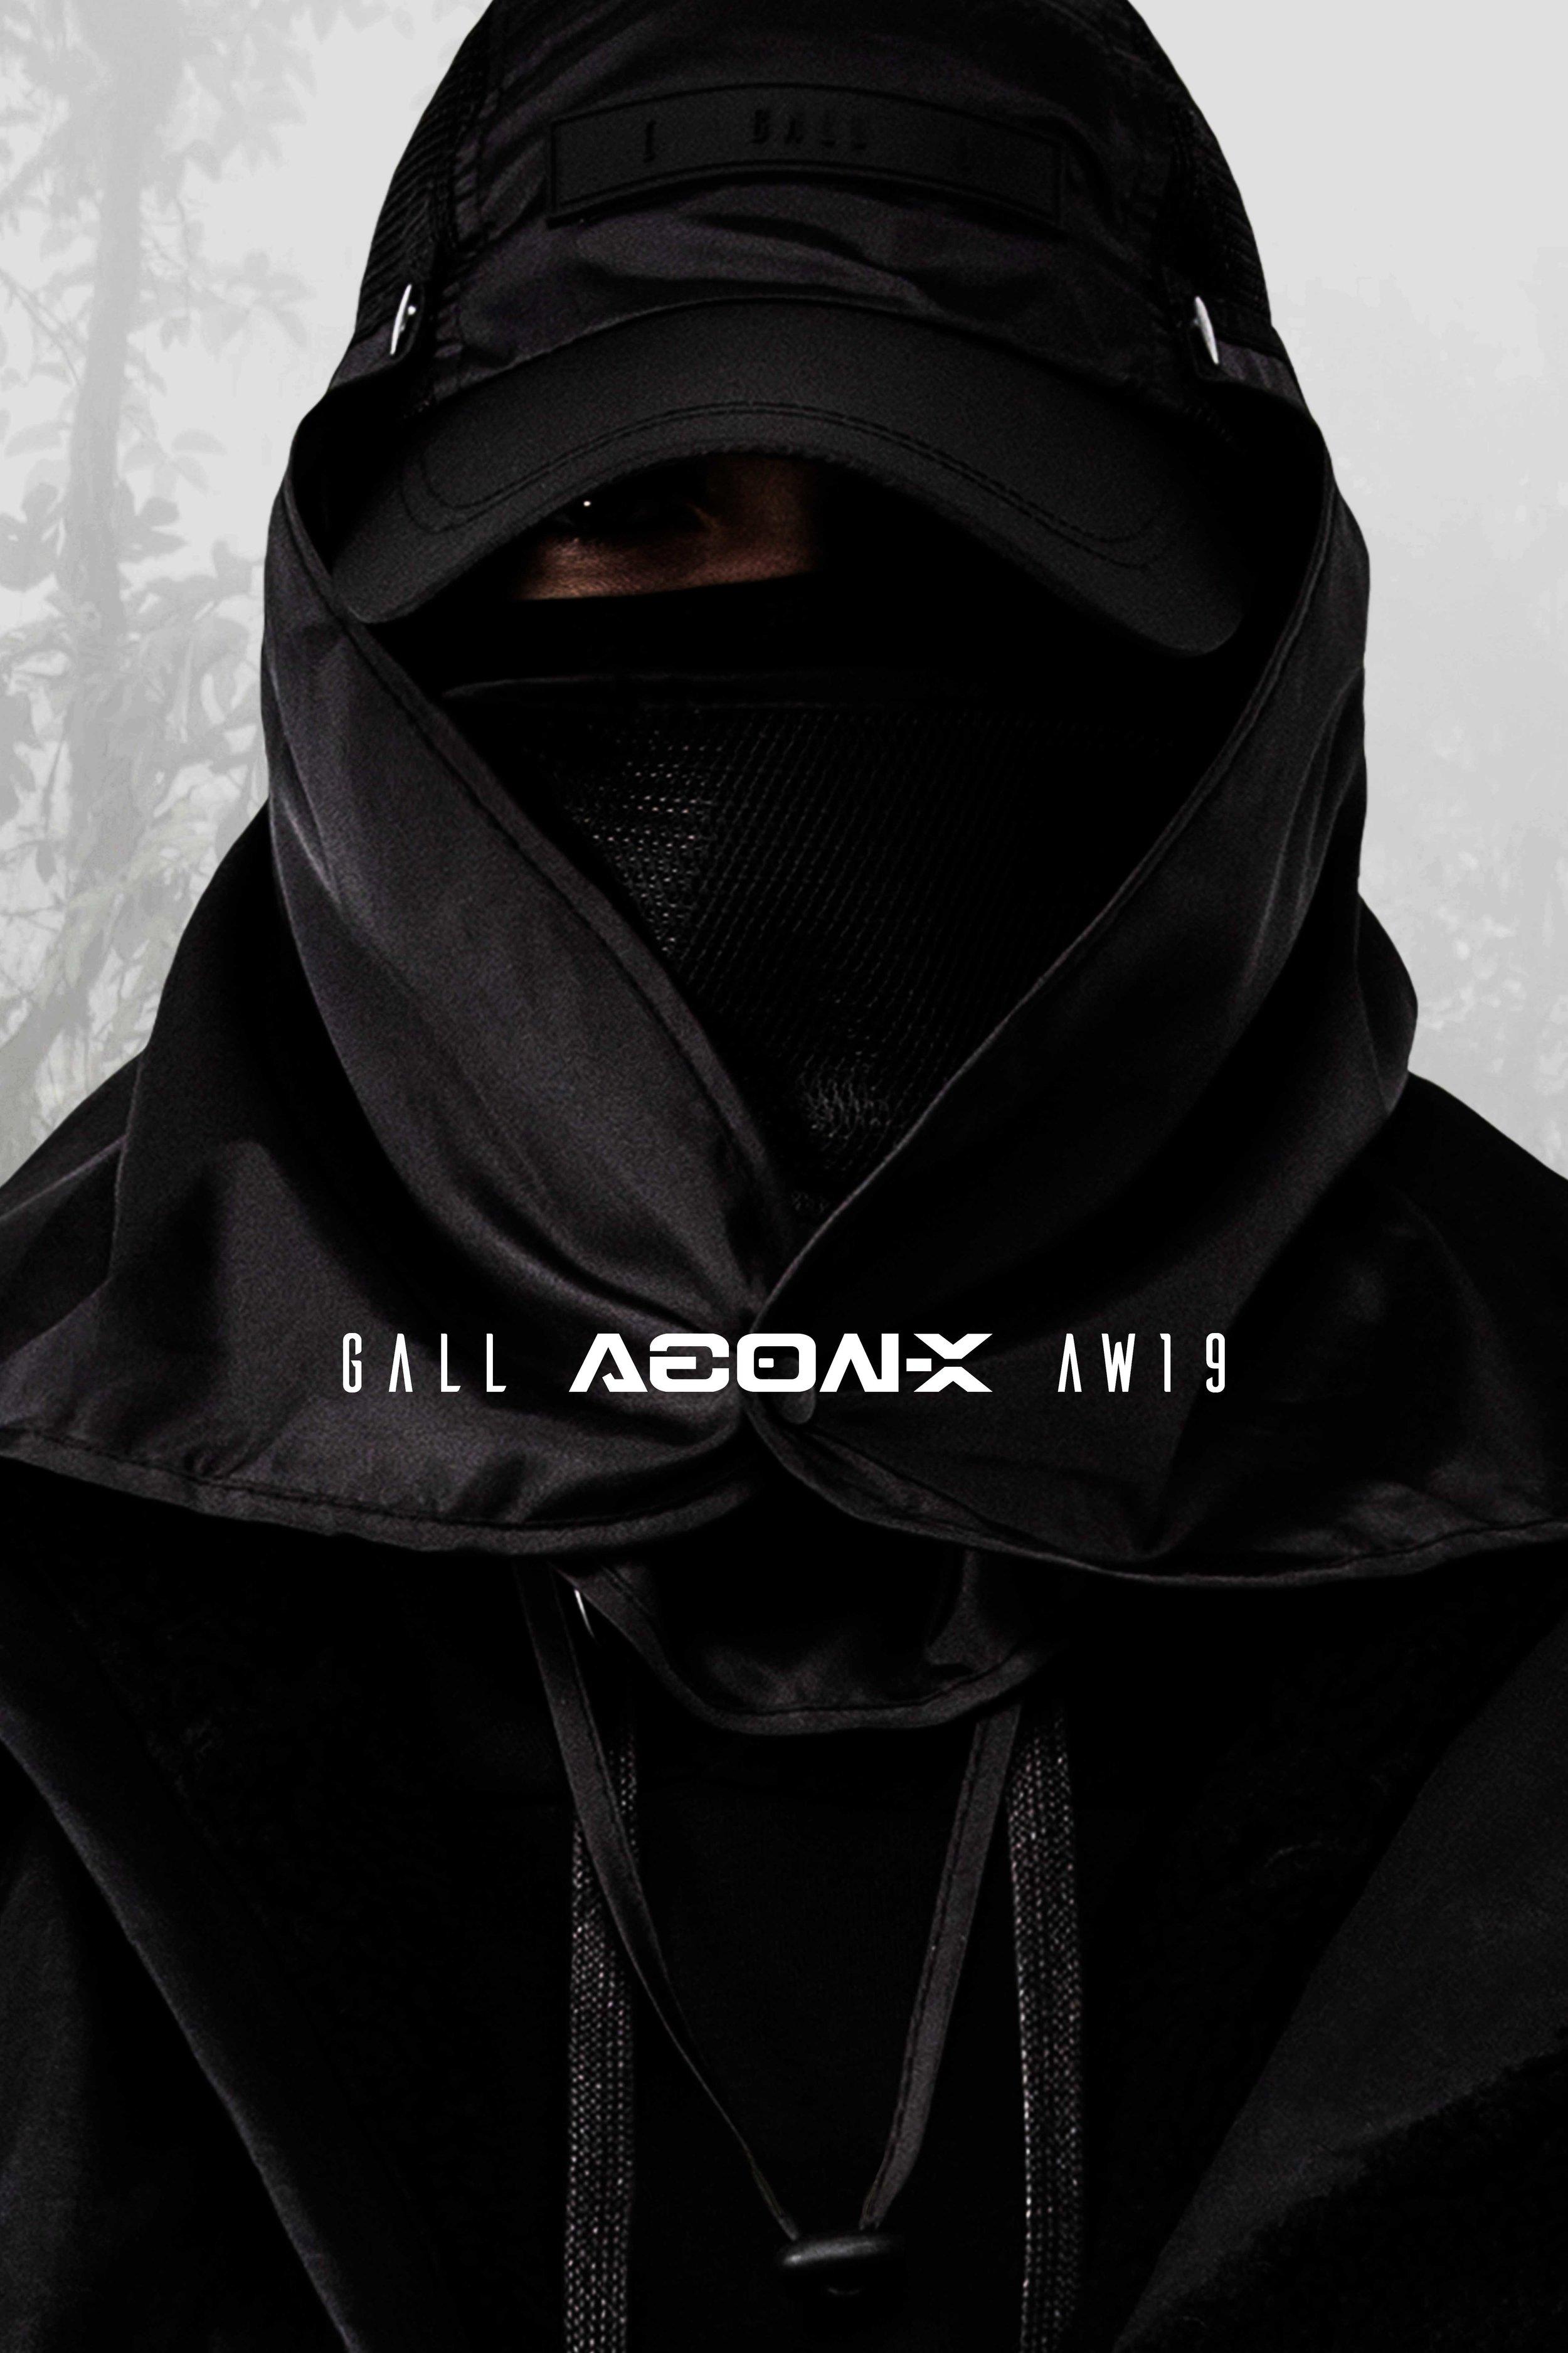 GALL_AEONX_AW19_LOOKBOOK_LOOK0.jpg